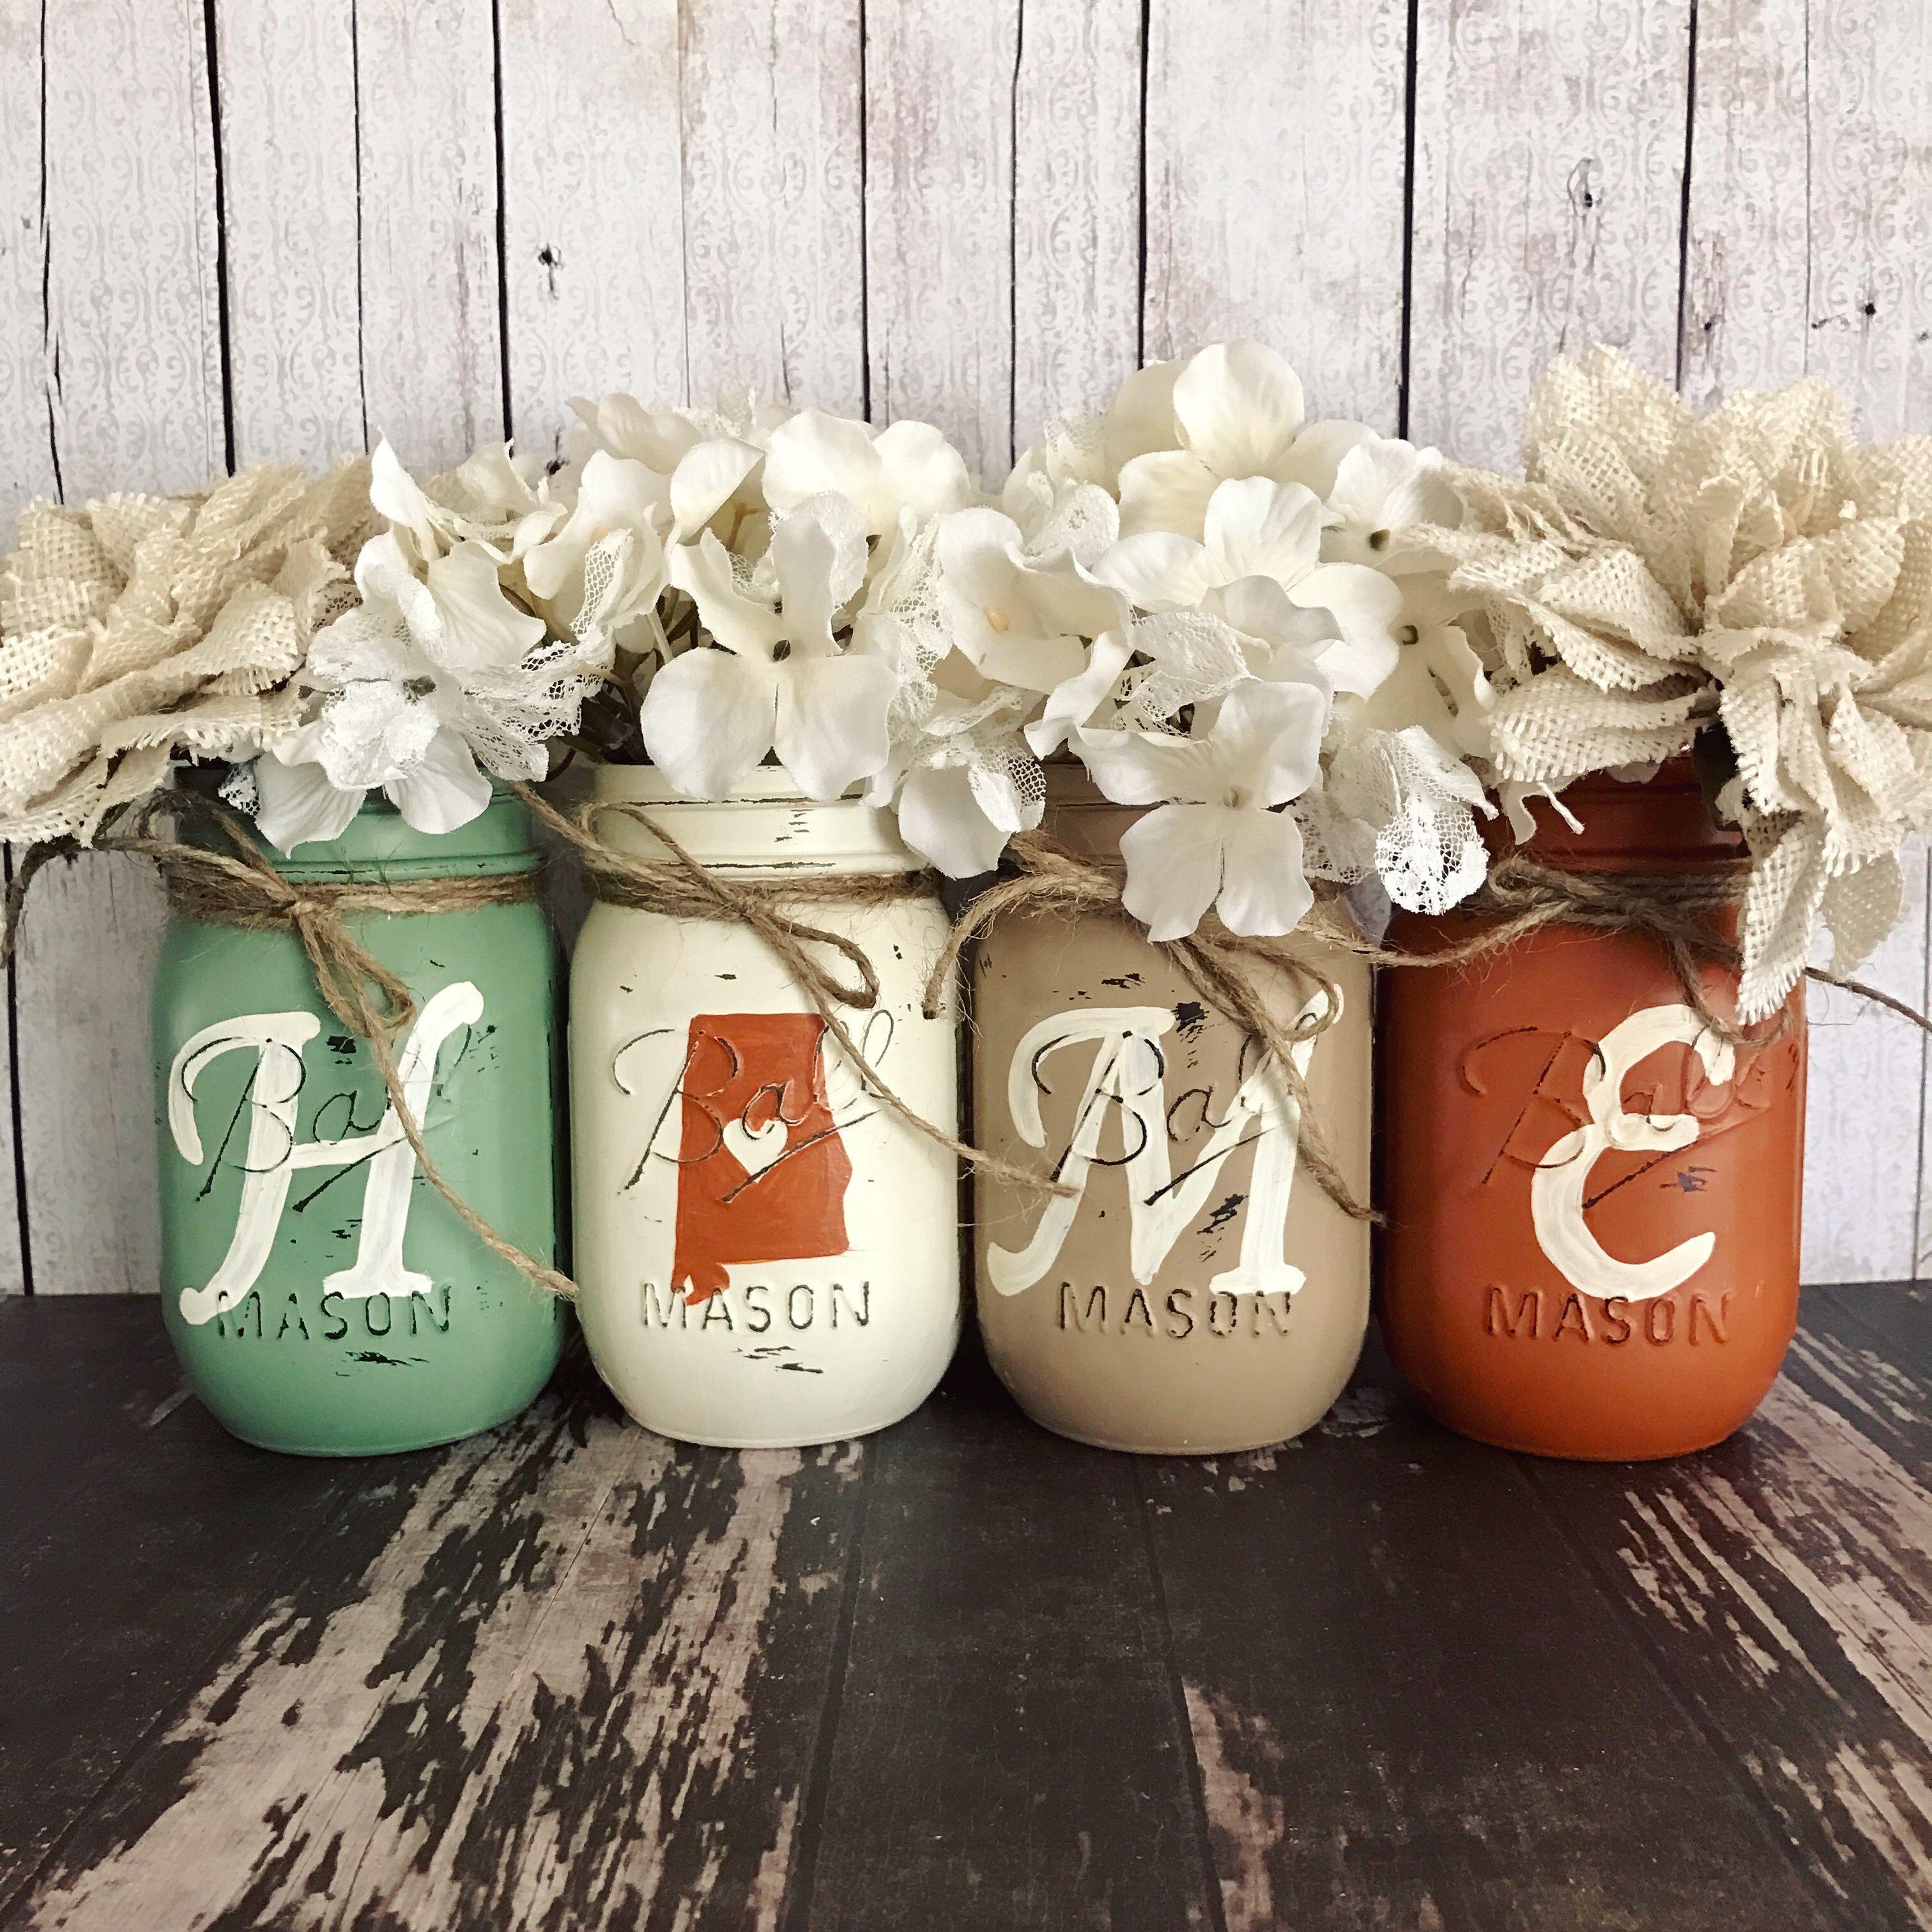 Mason Jar Home Decor Home State Mason Jar Set  Sage Orange And Tan  Rustic Home Decor